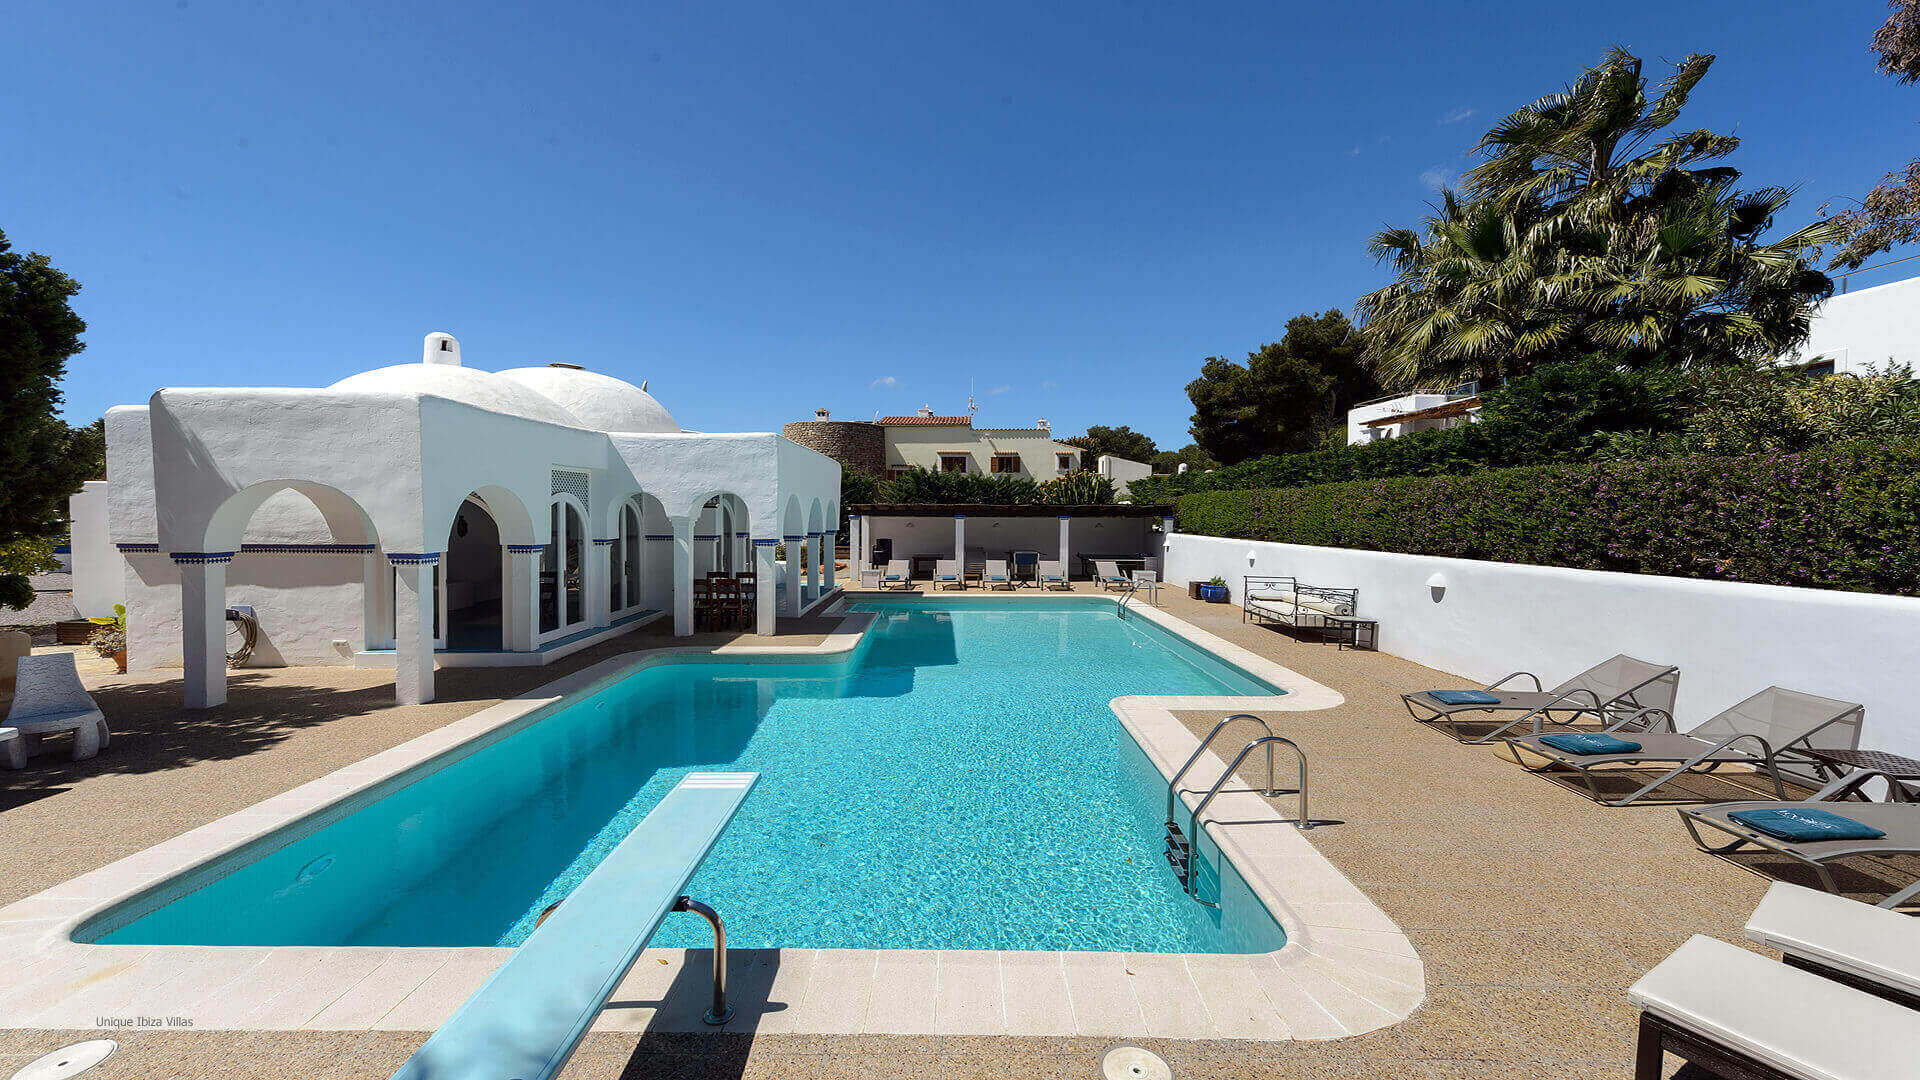 Villa Cigala Ibiza 7 Santa Eulalia